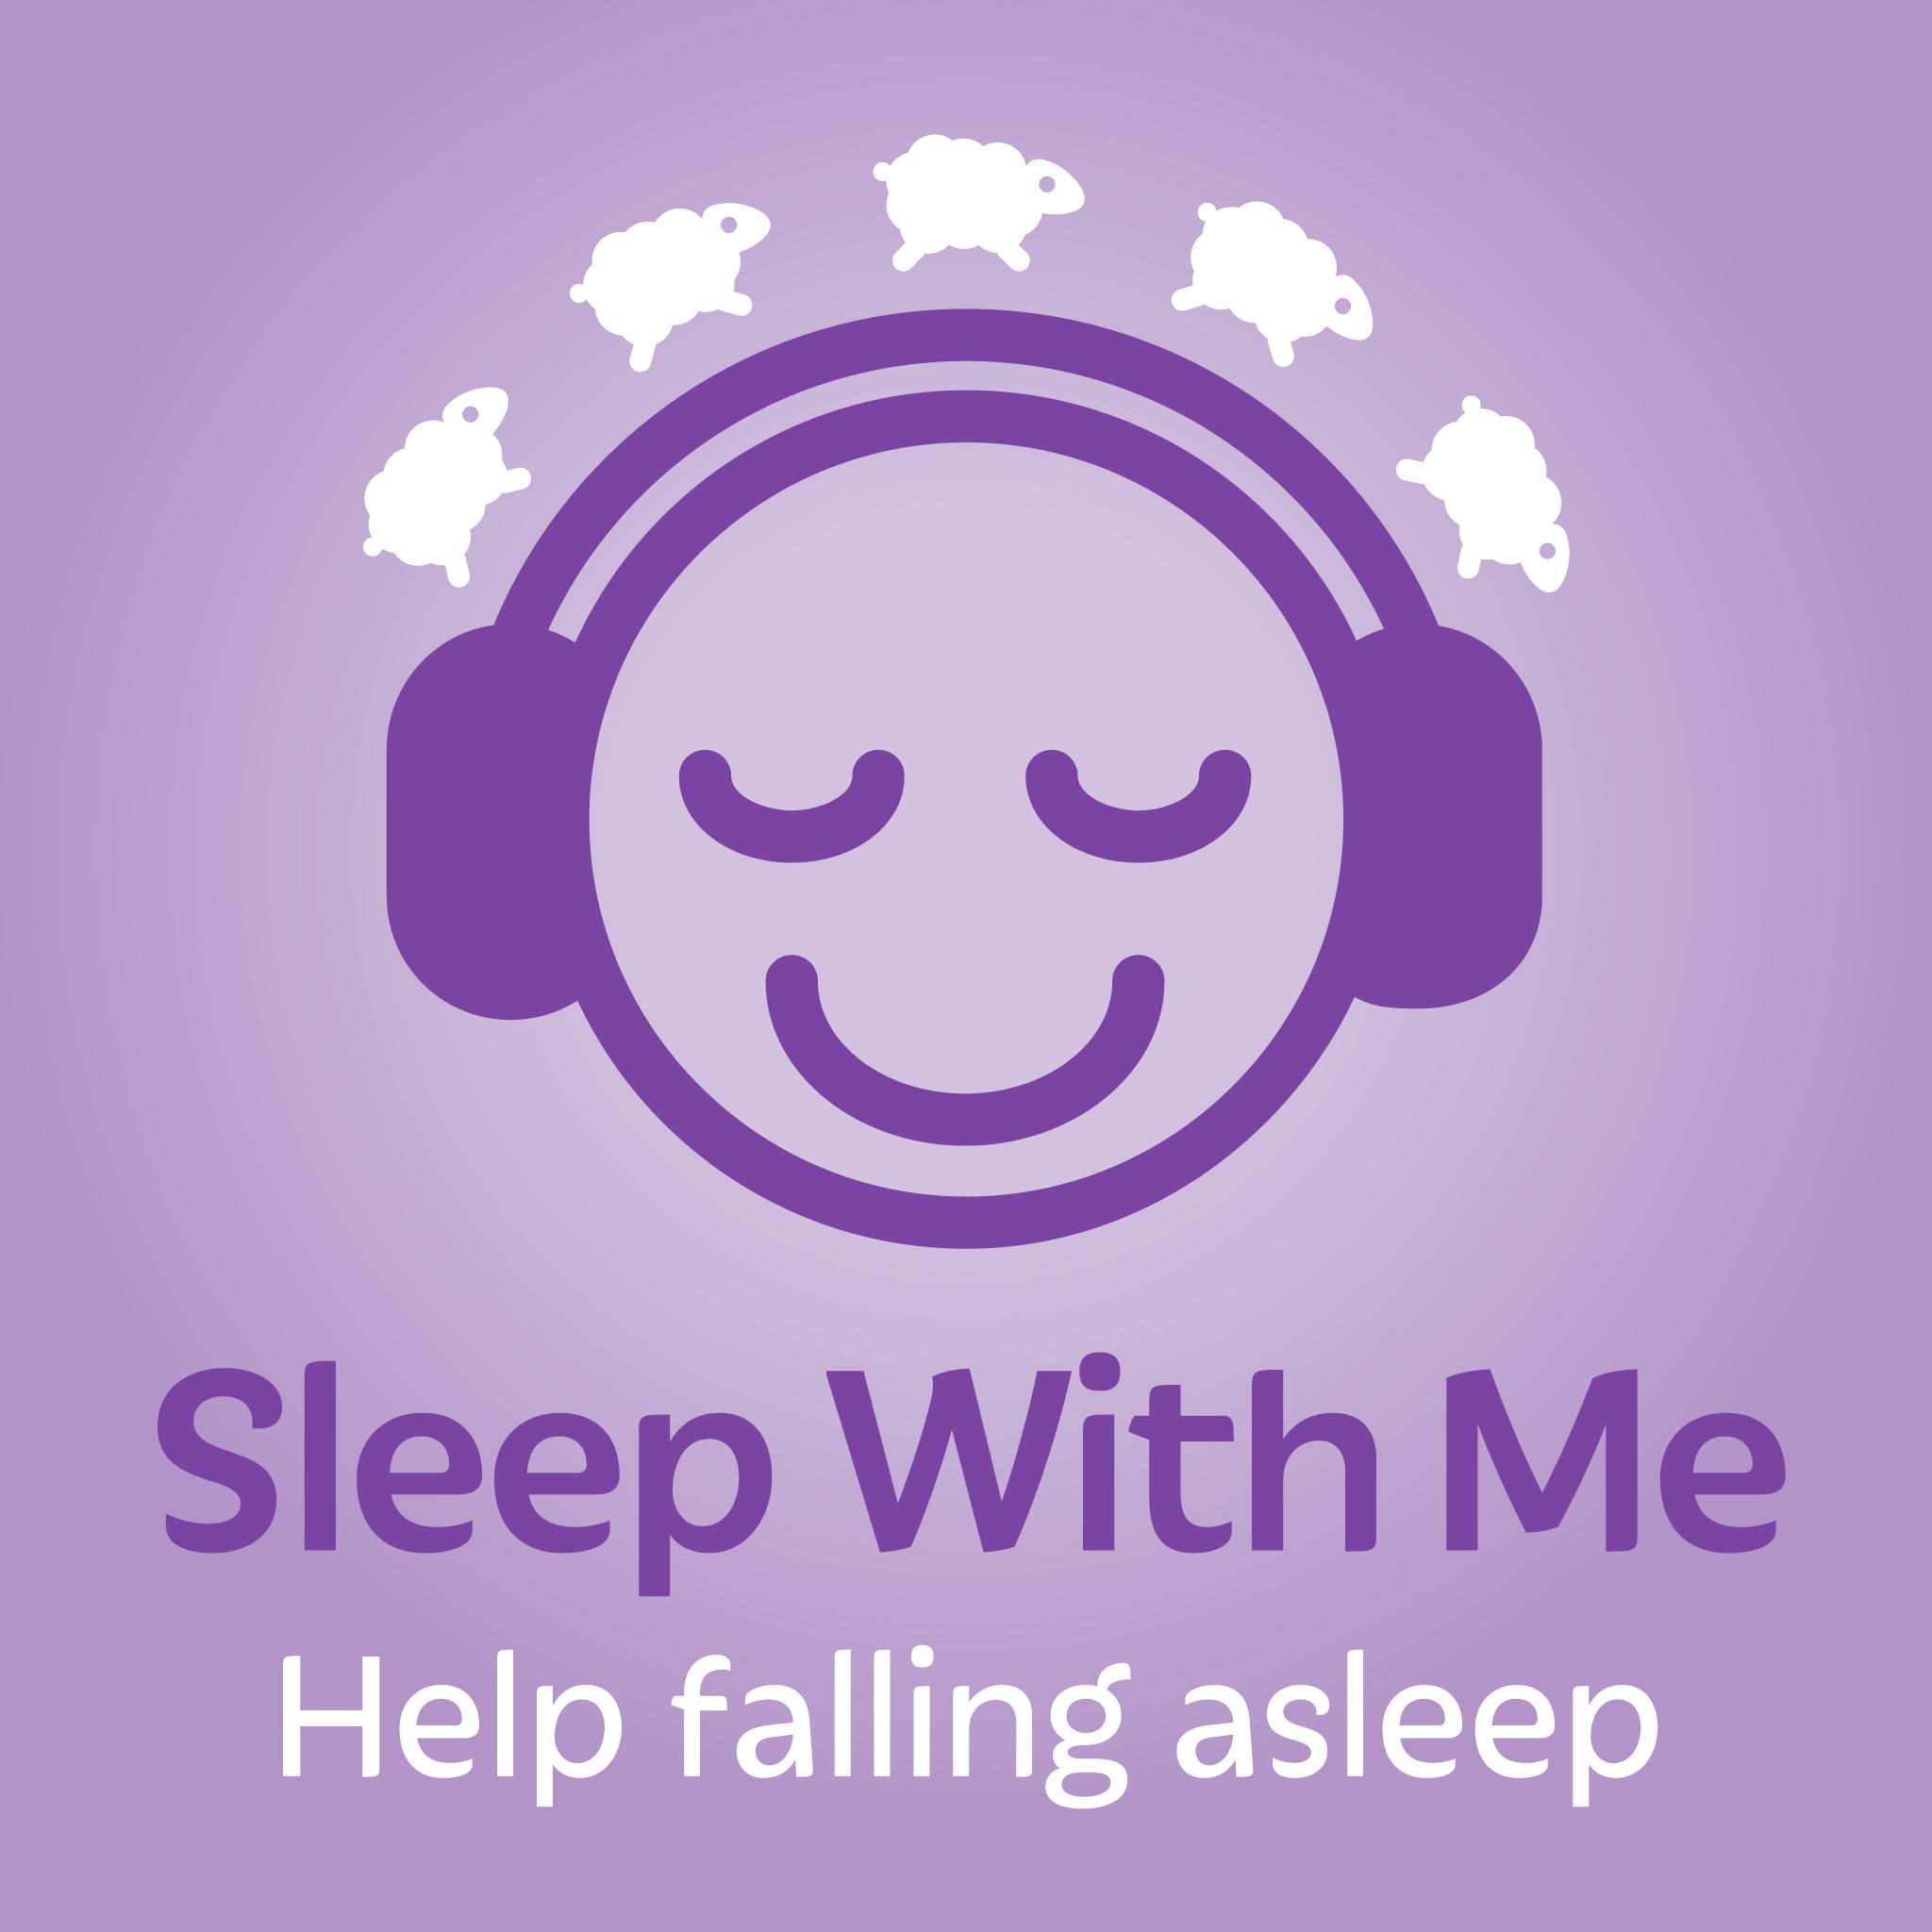 Sleep With Me | Helps You Fall Asleep Via Silly Boring Bedtime Stories